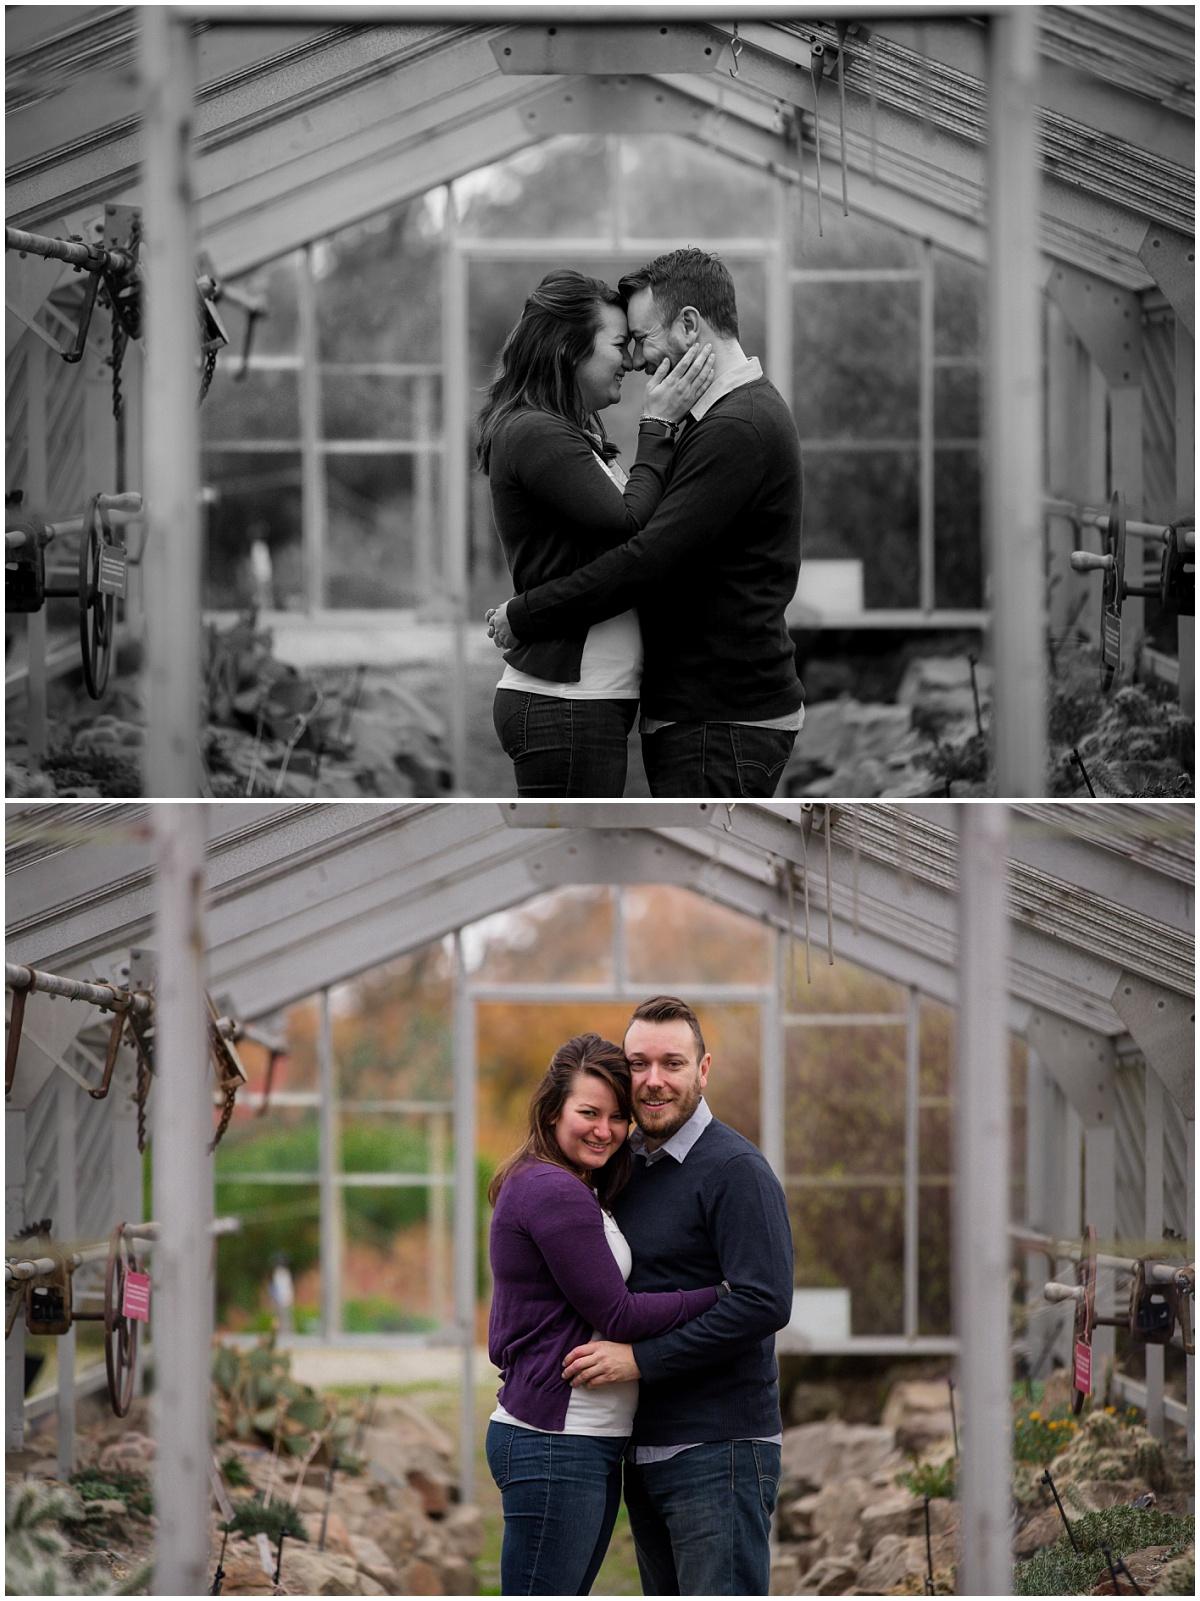 Amazing Day Photography - Langley Wedding Photographer - UBC Engagement Session - Gastown Engagement Session - Pub Engagement Session - Vancouver Photographer (13).jpg